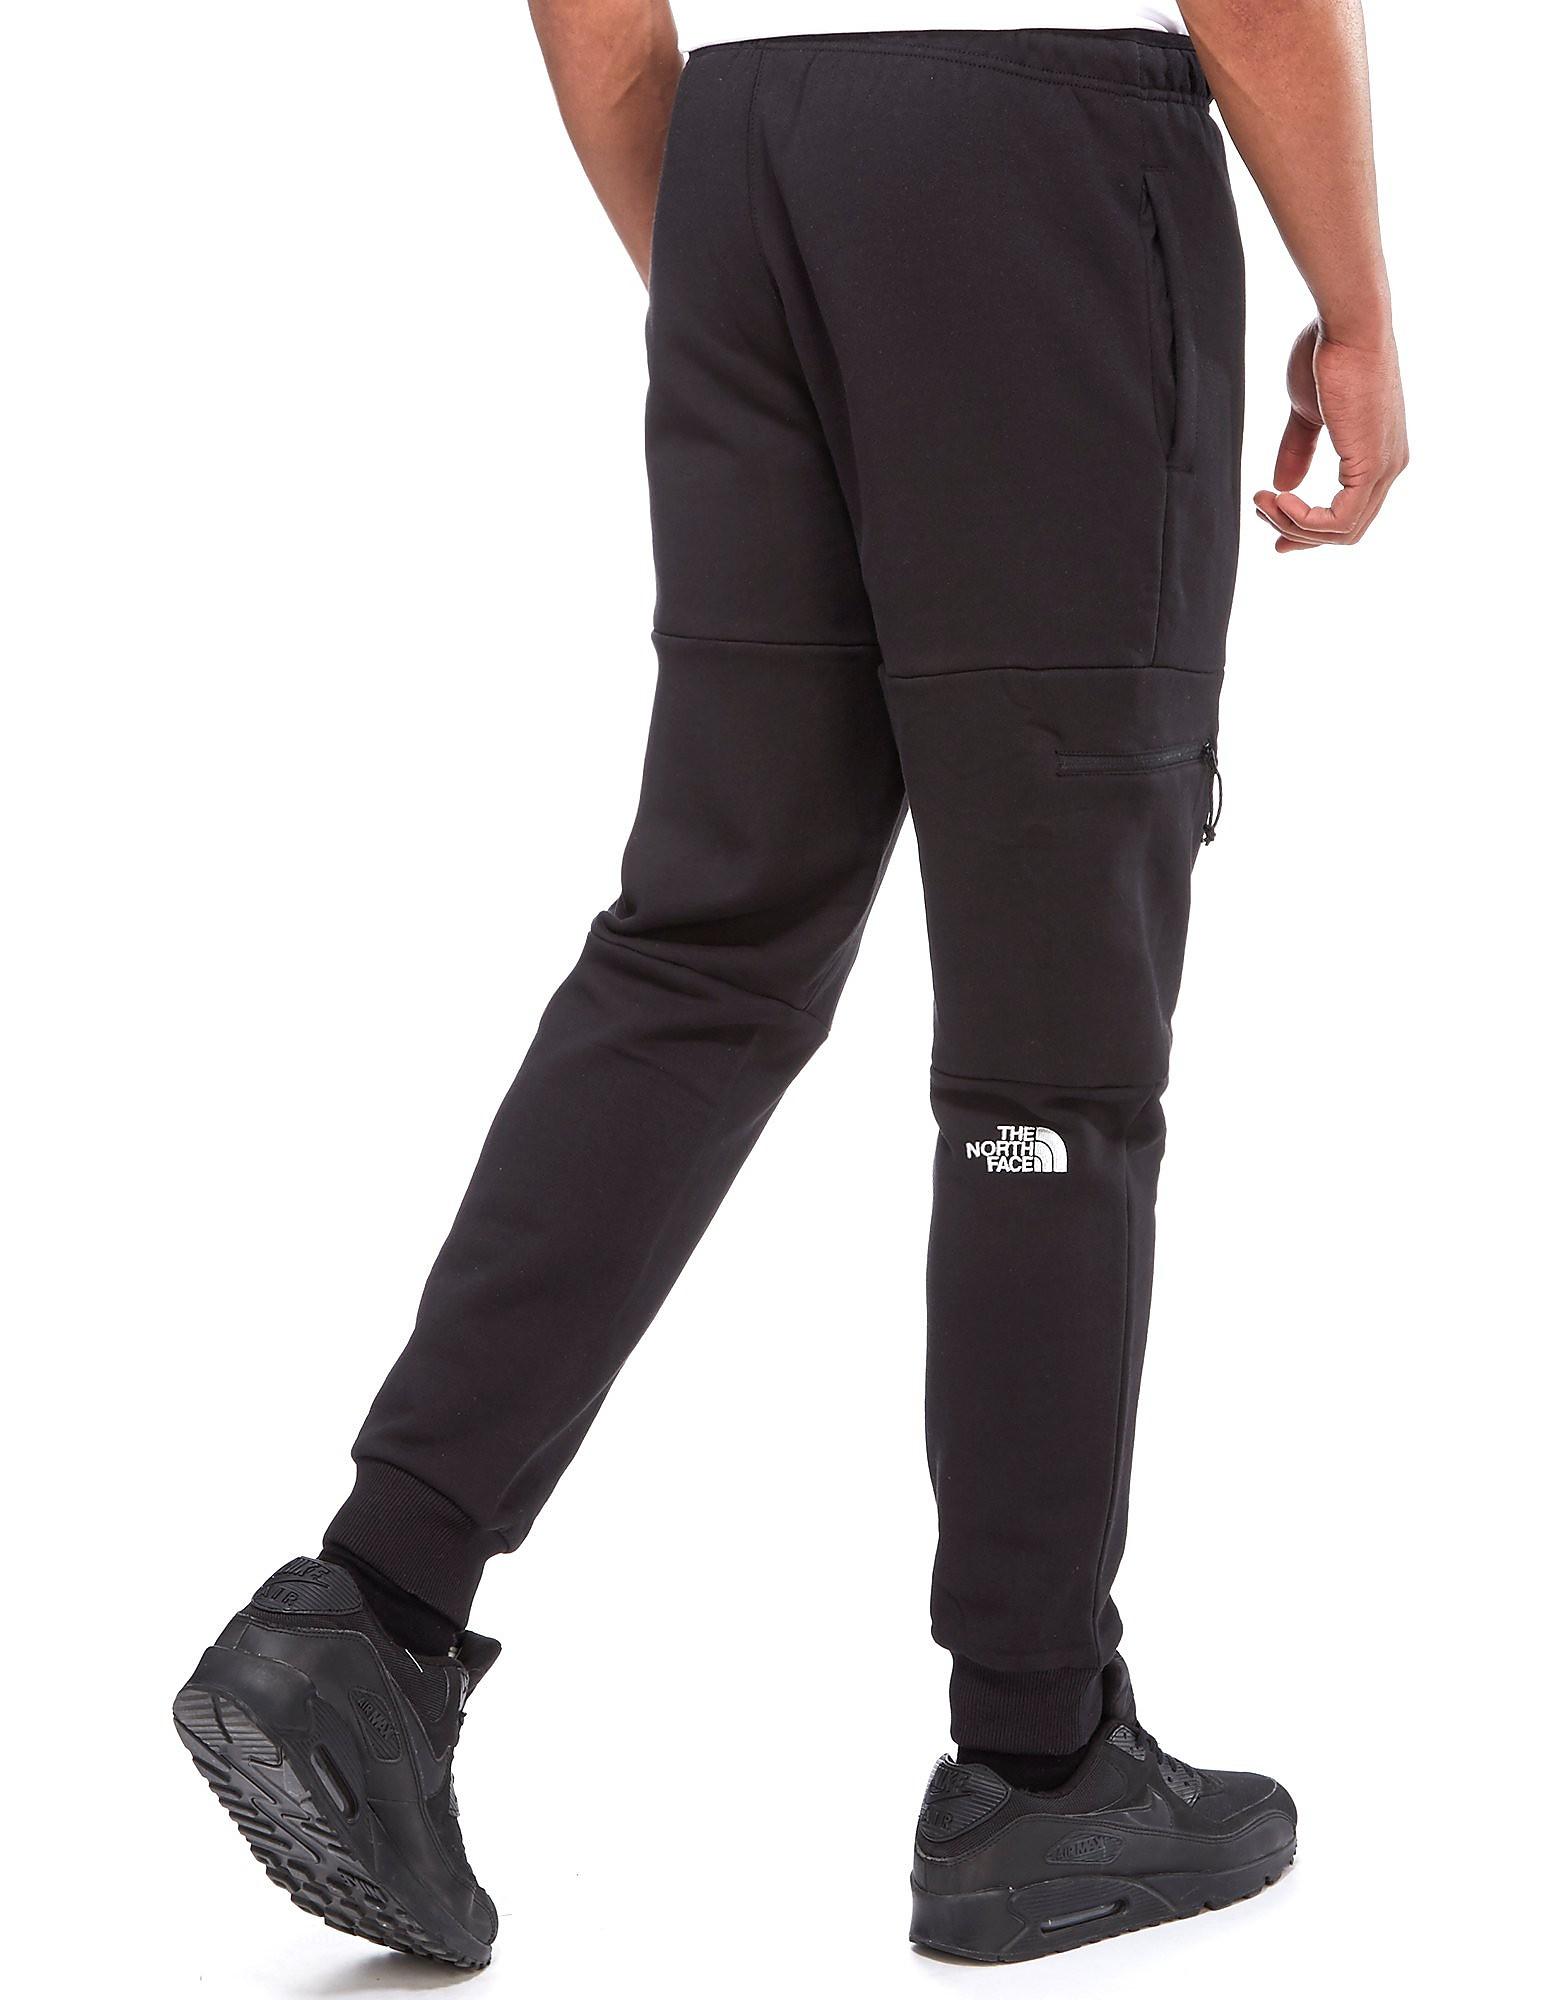 The North Face Z Pocket Pants